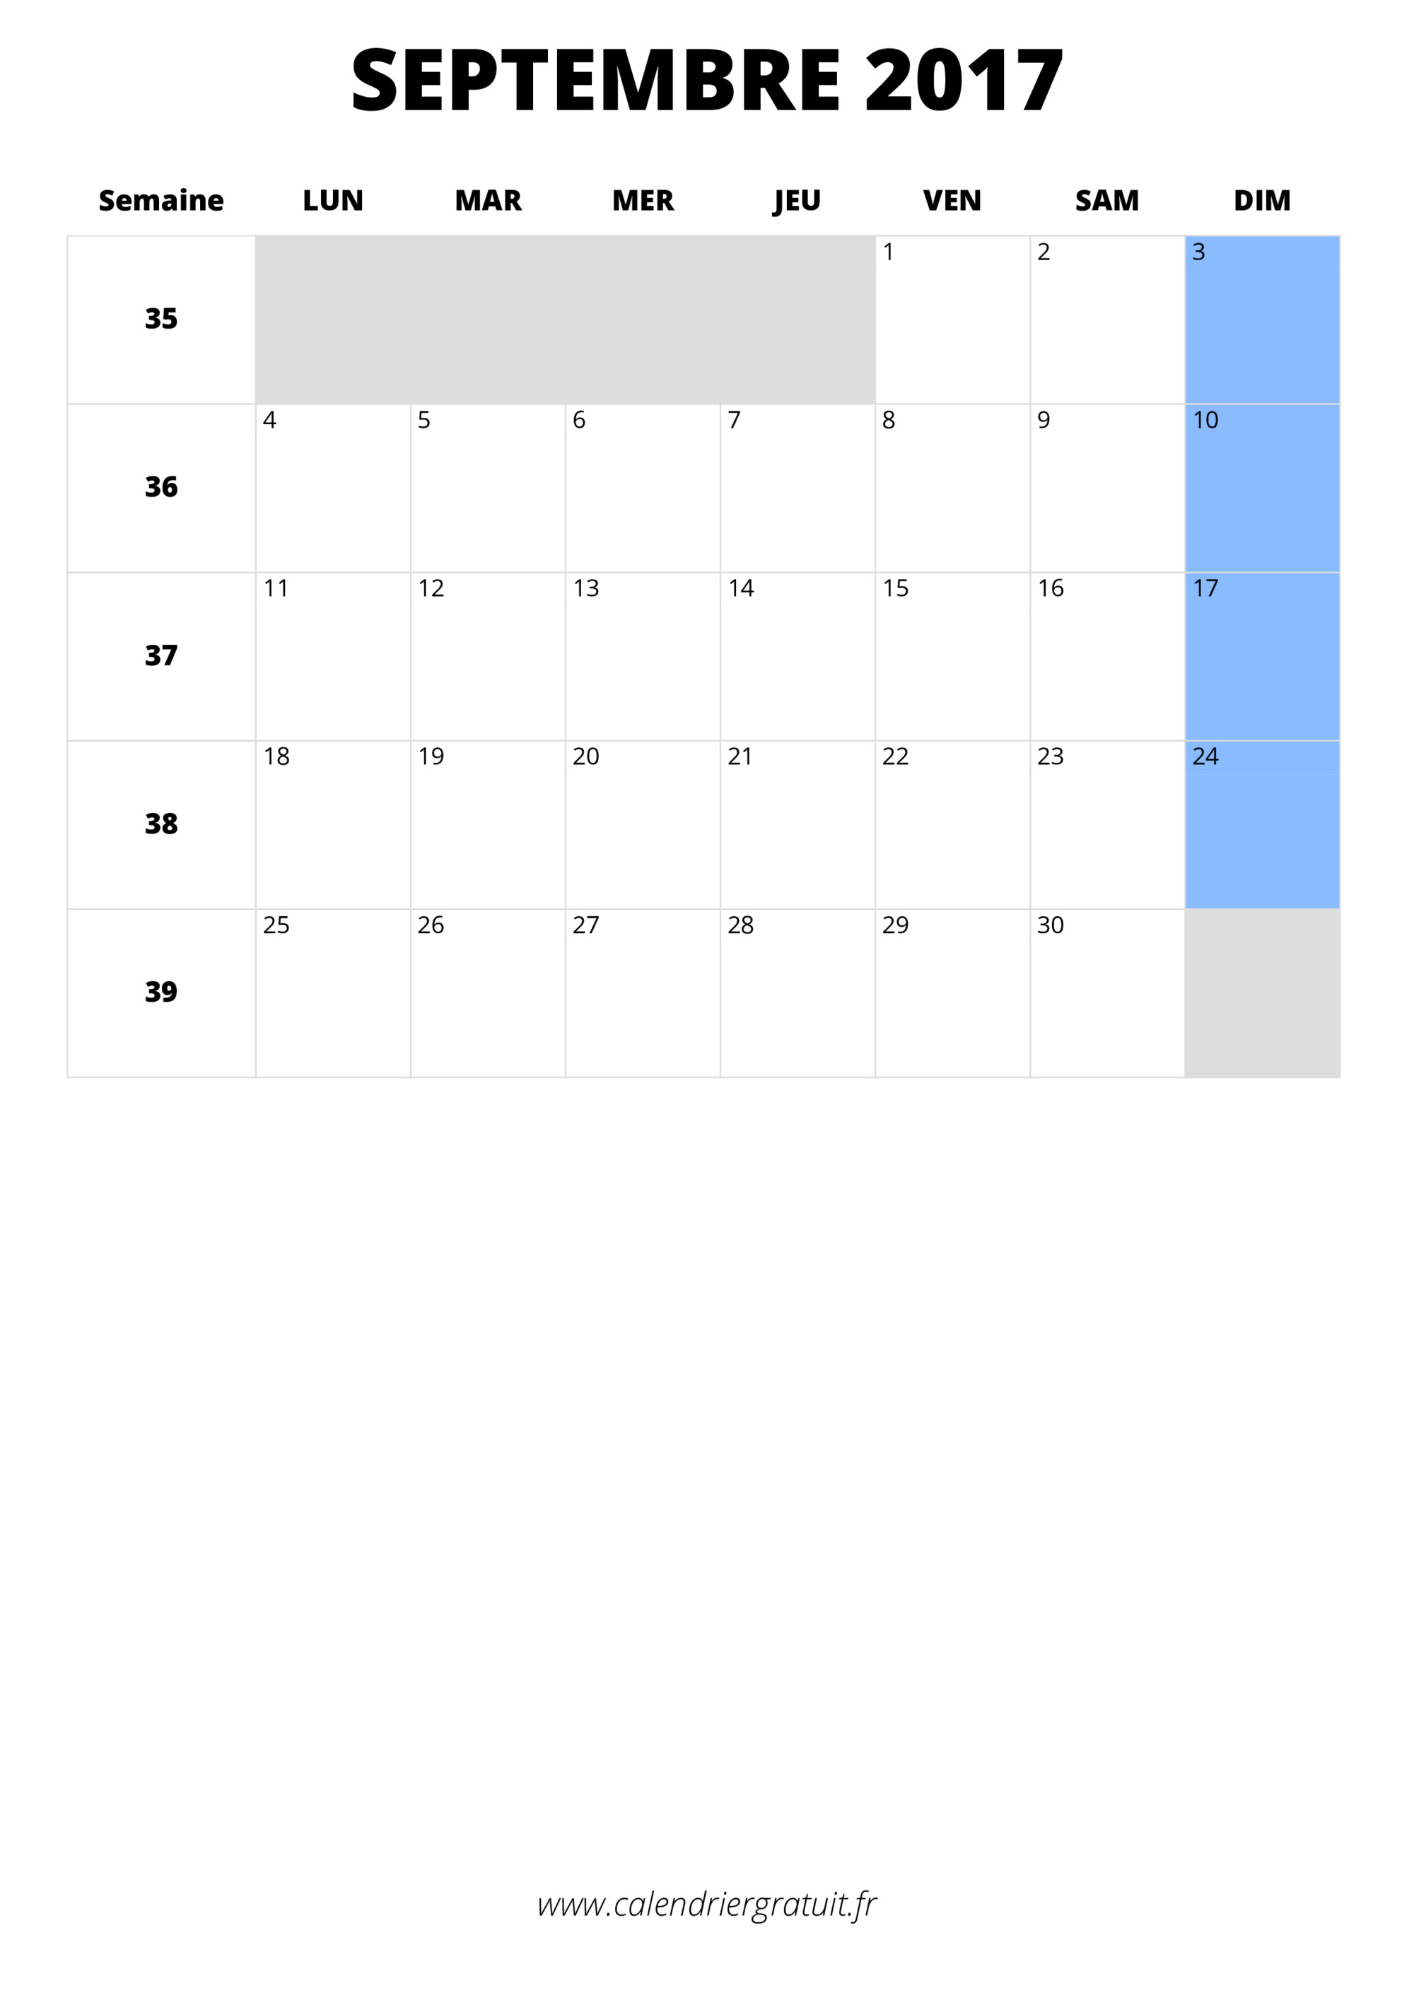 calendriergratuit.fr/images/mensuel/calendrier-septembre-2017-P.jpg